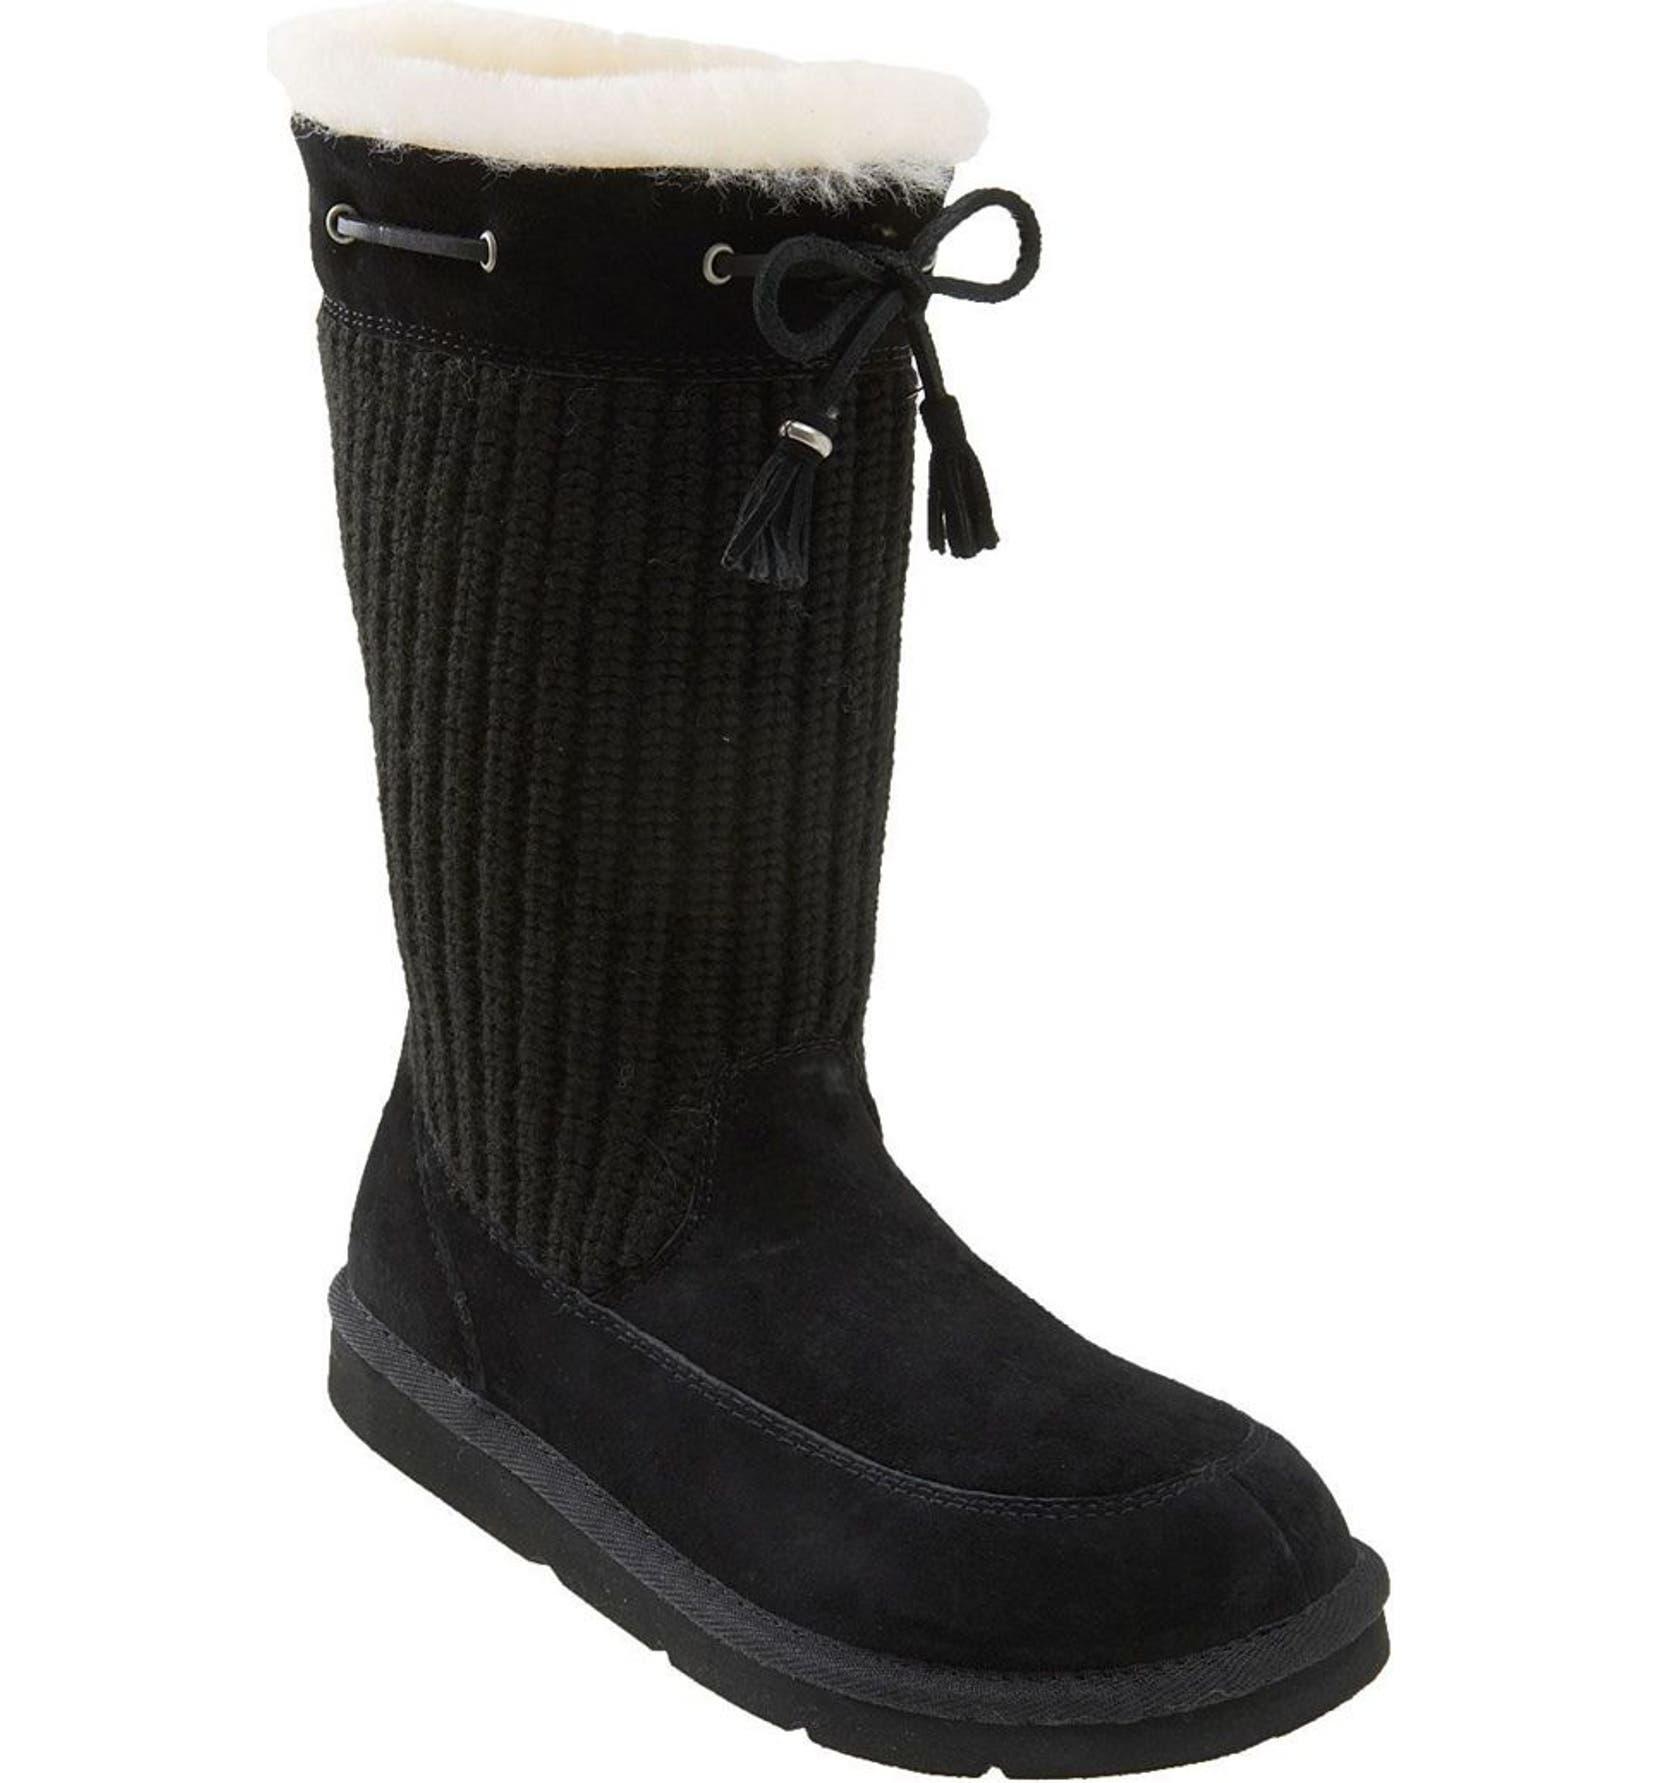 690cec05f7b Australia 'Suburb Crochet' Boot